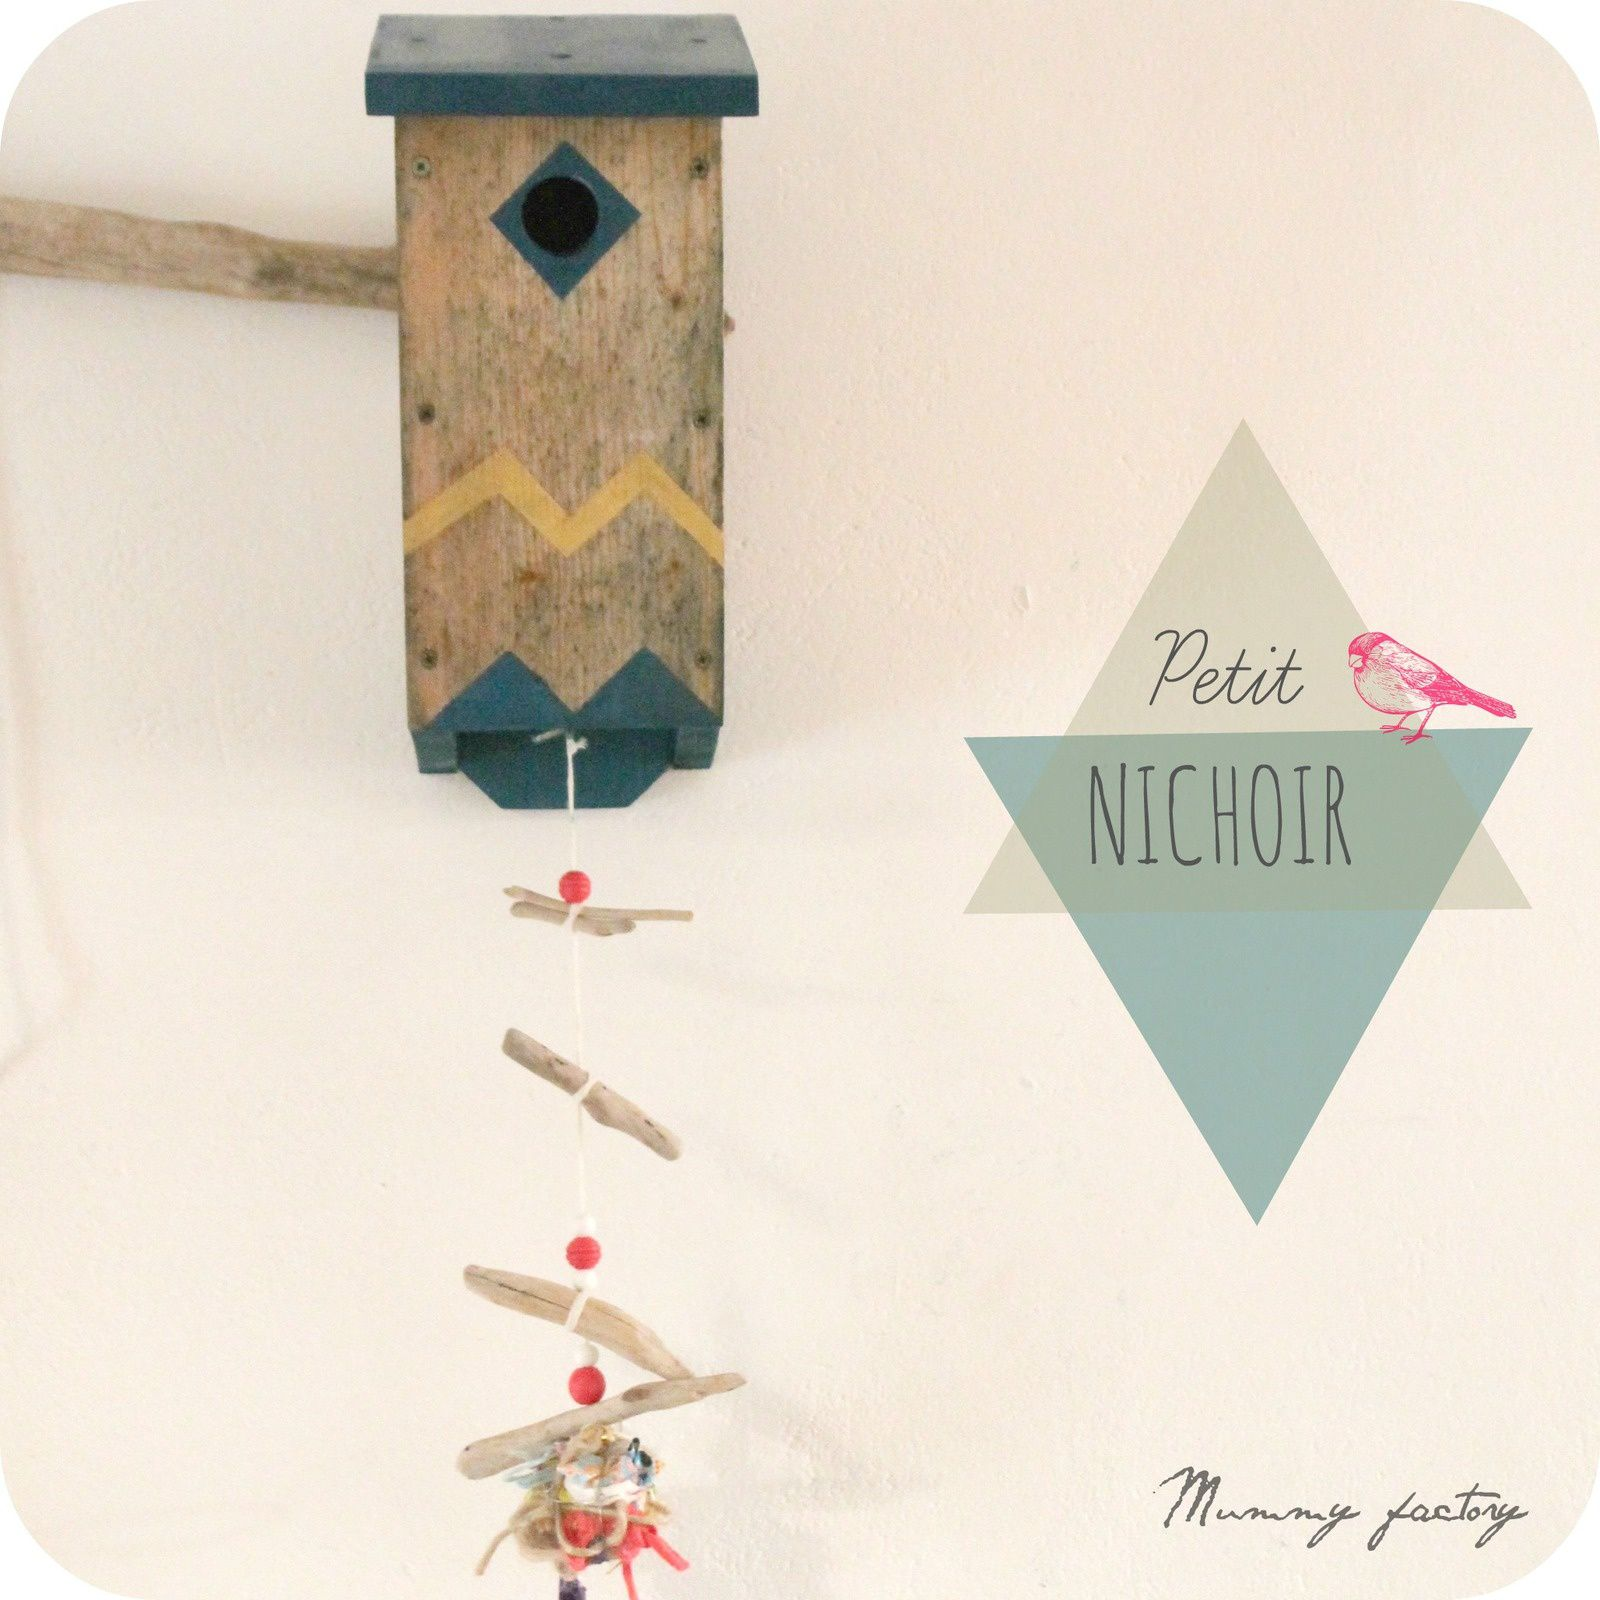 # Petit nichoir